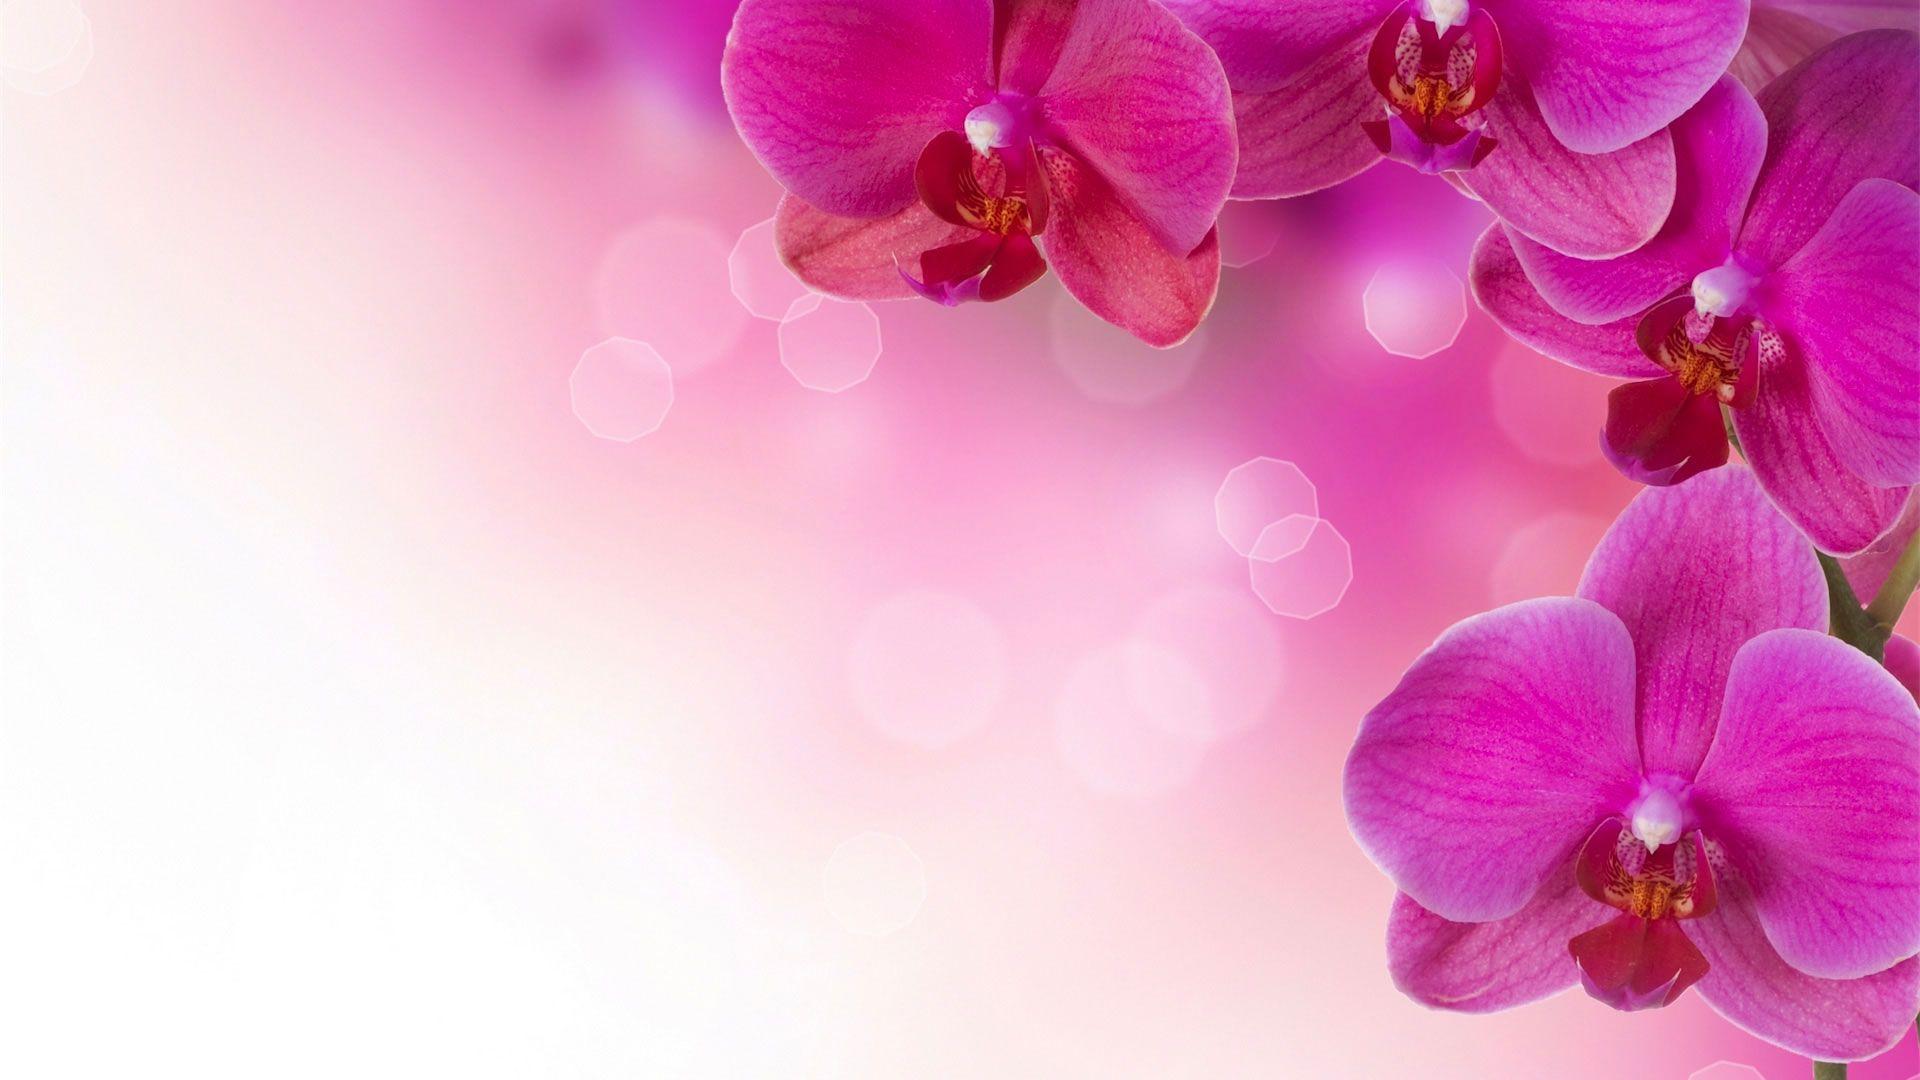 Hd pics photos flowers pink orchid desktop background wallpaper hd pics photos flowers pink orchid desktop background wallpaper mightylinksfo